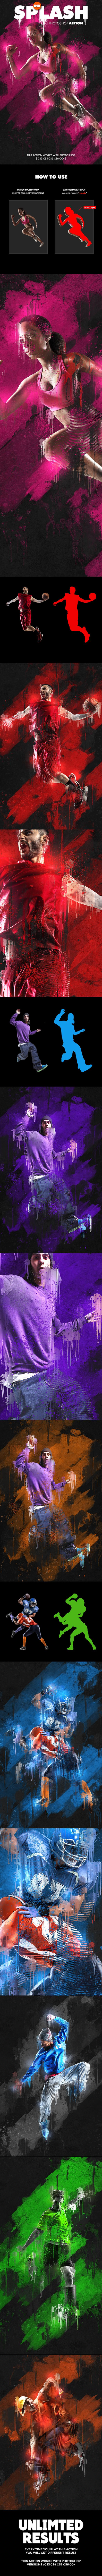 GraphicRiver Ink Splash Photoshop Action 20782102